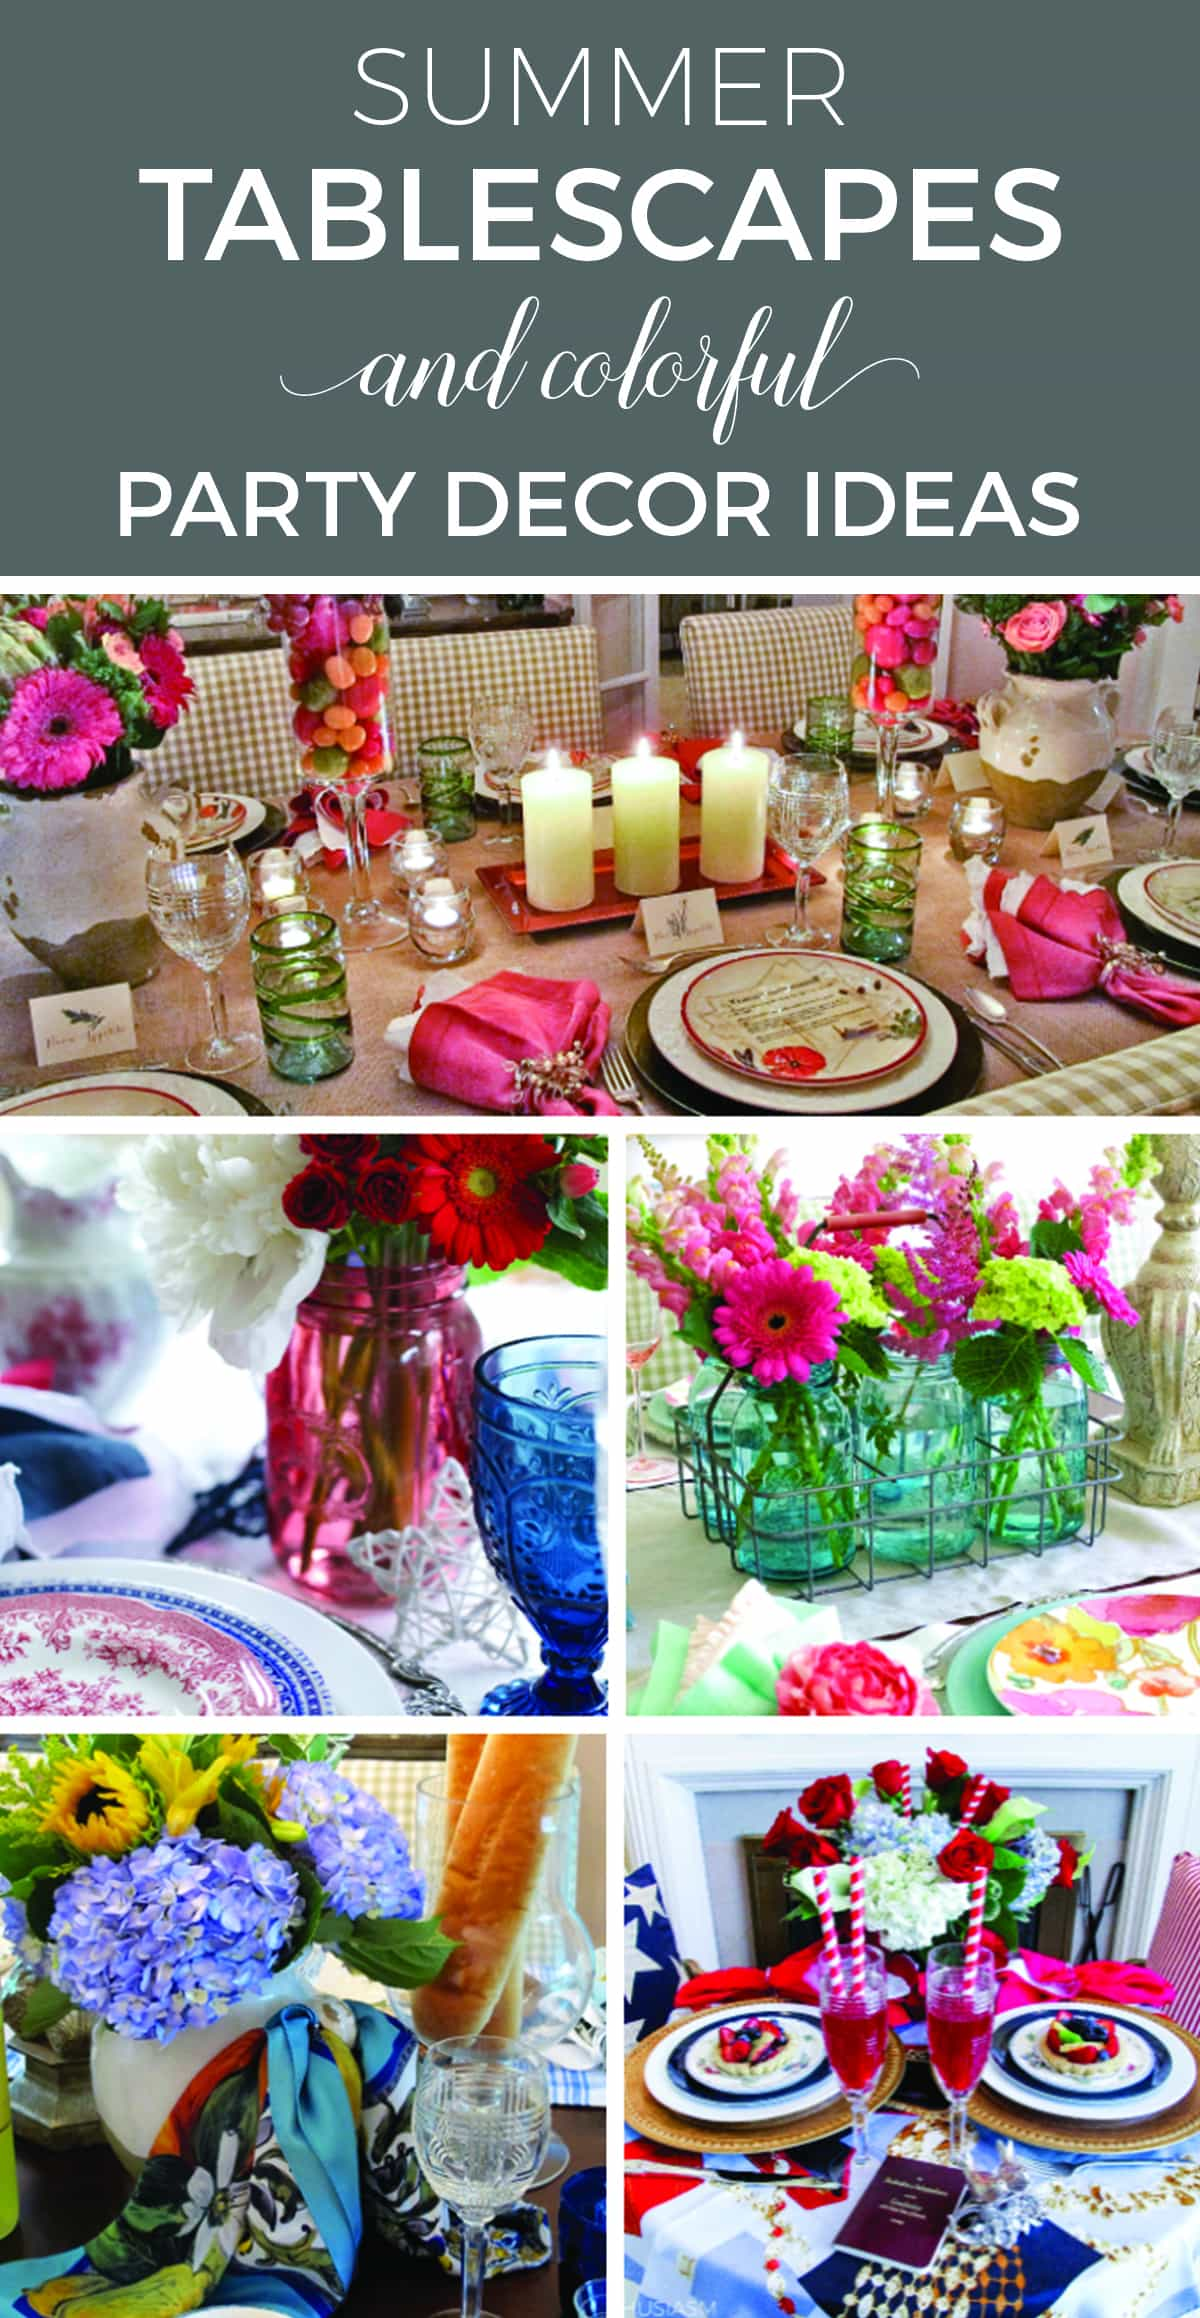 Summer Party Decorations: 6 Colorful Tablescape Ideas - designthusiasm.com